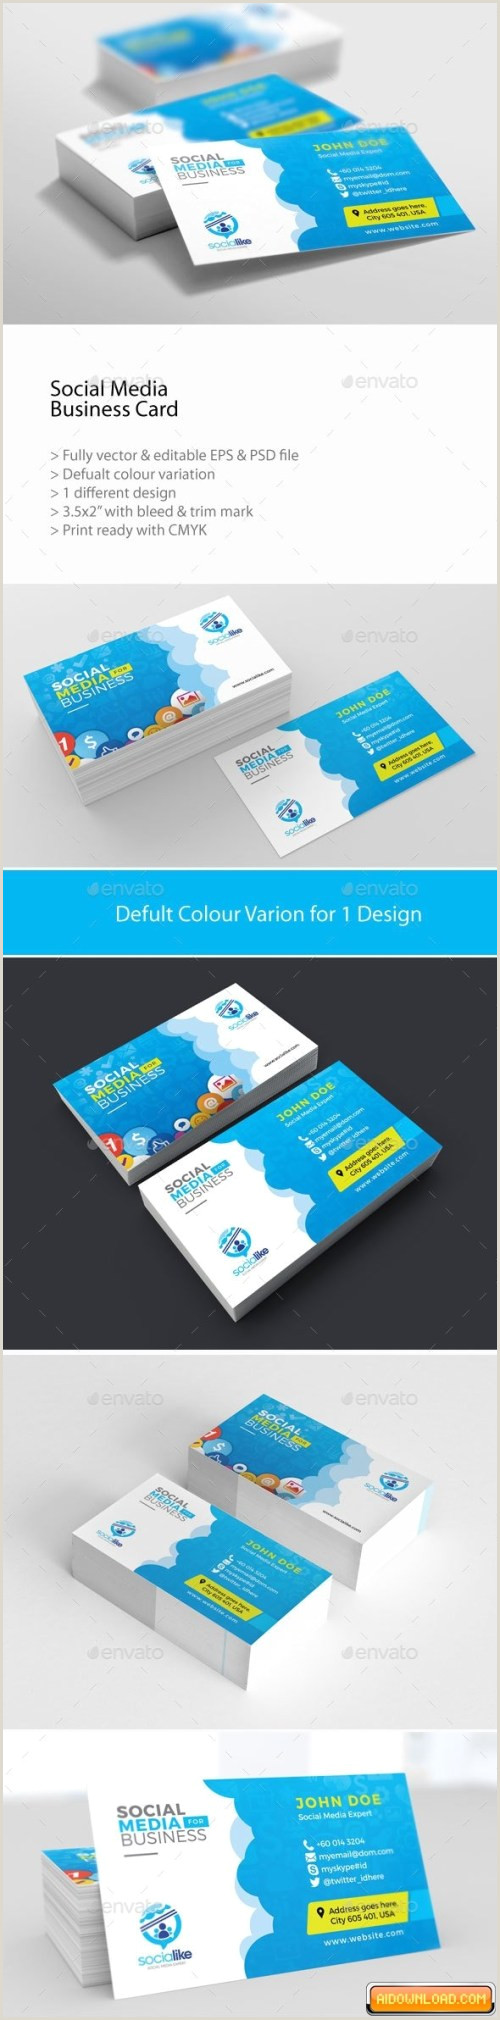 Business Card Social Media Social Media Business Card Free Download